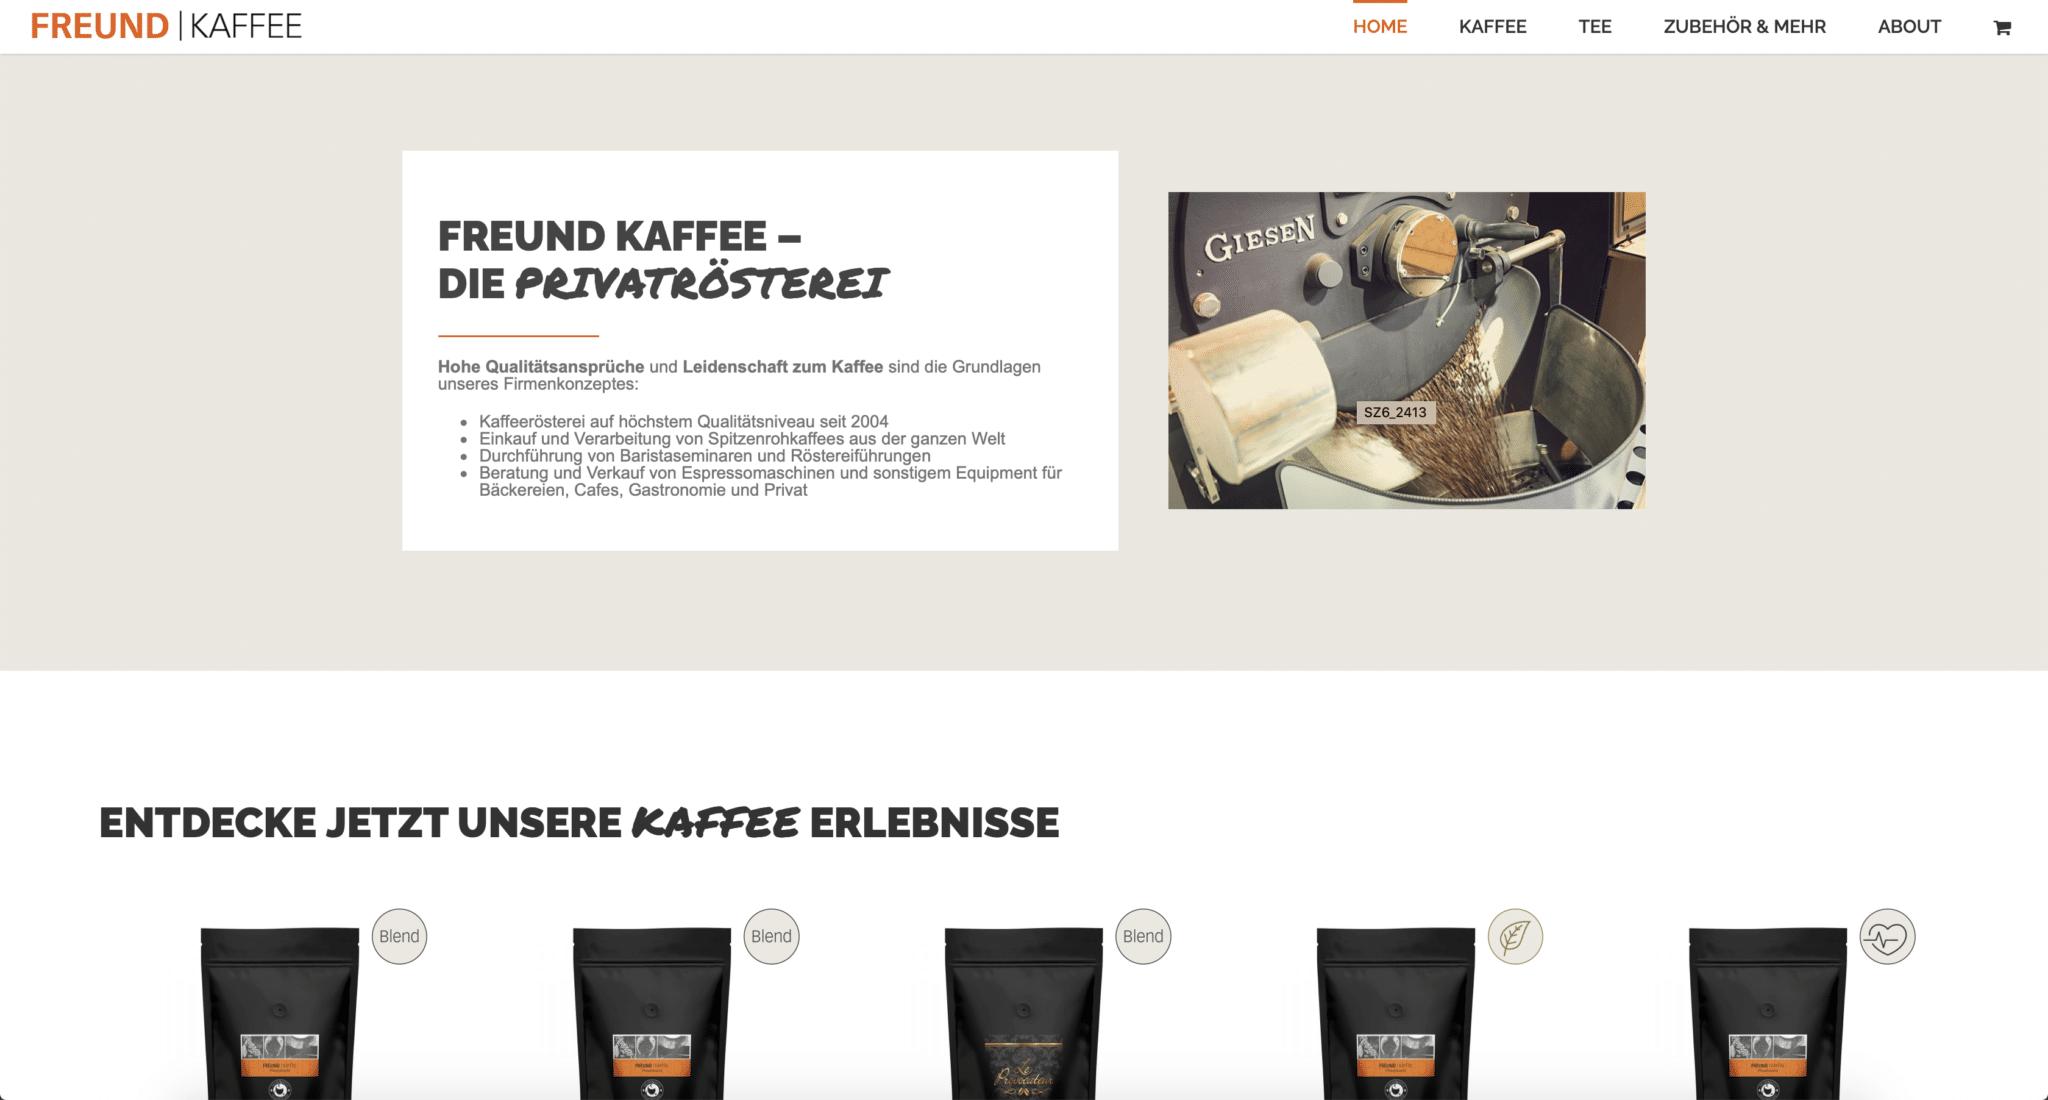 Webshop Onlineshop Online Shop Webseite Ladenbau Kaffee Freund